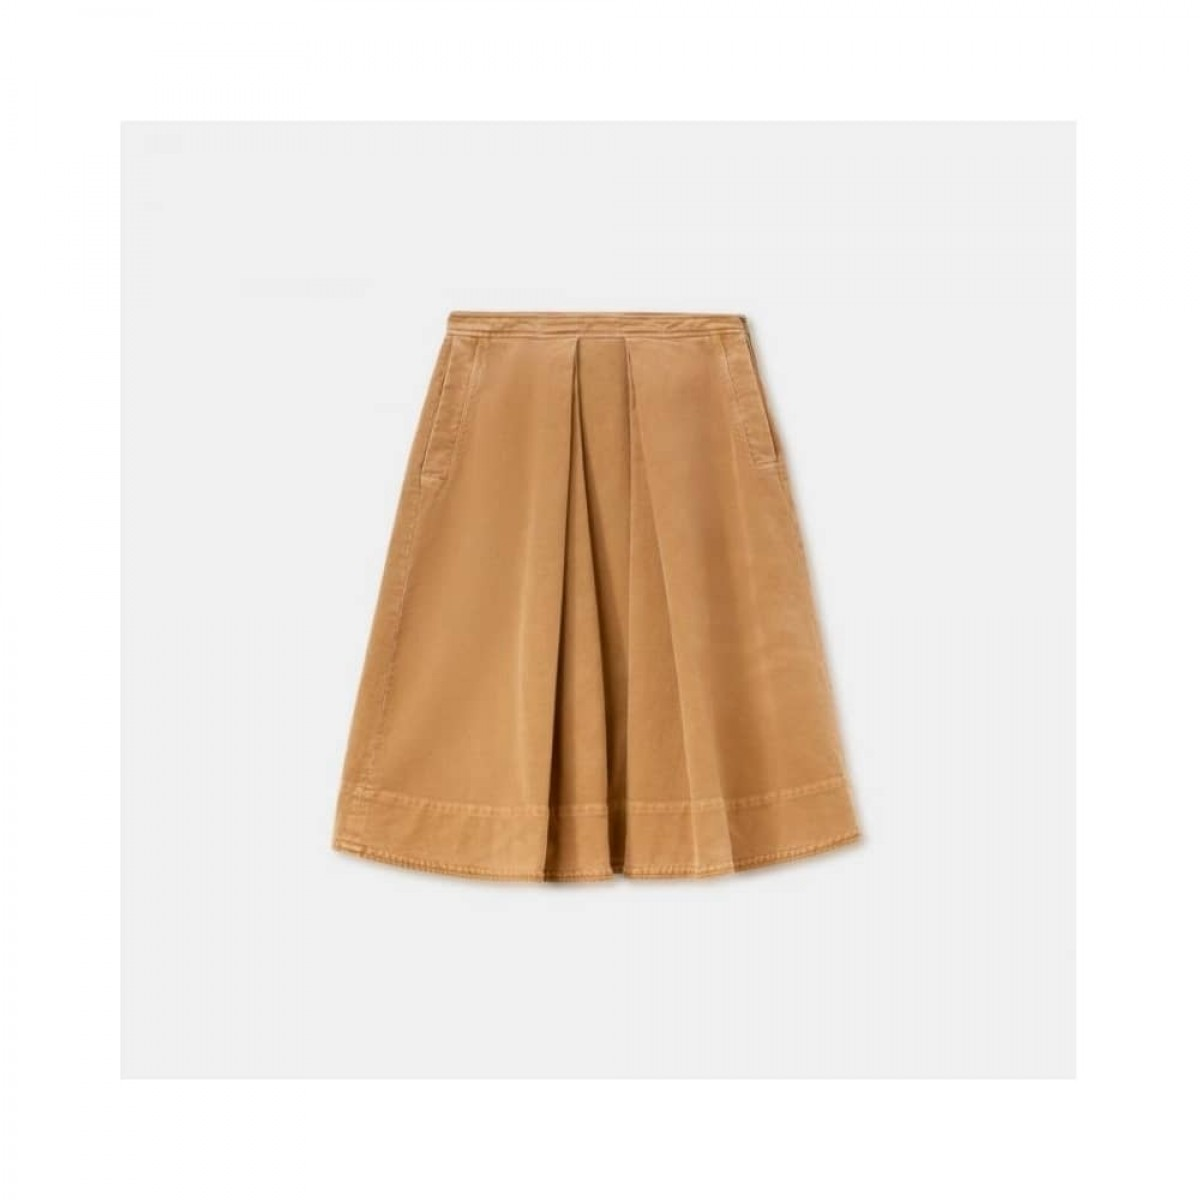 gonna moleskin nederdel - bronze - front